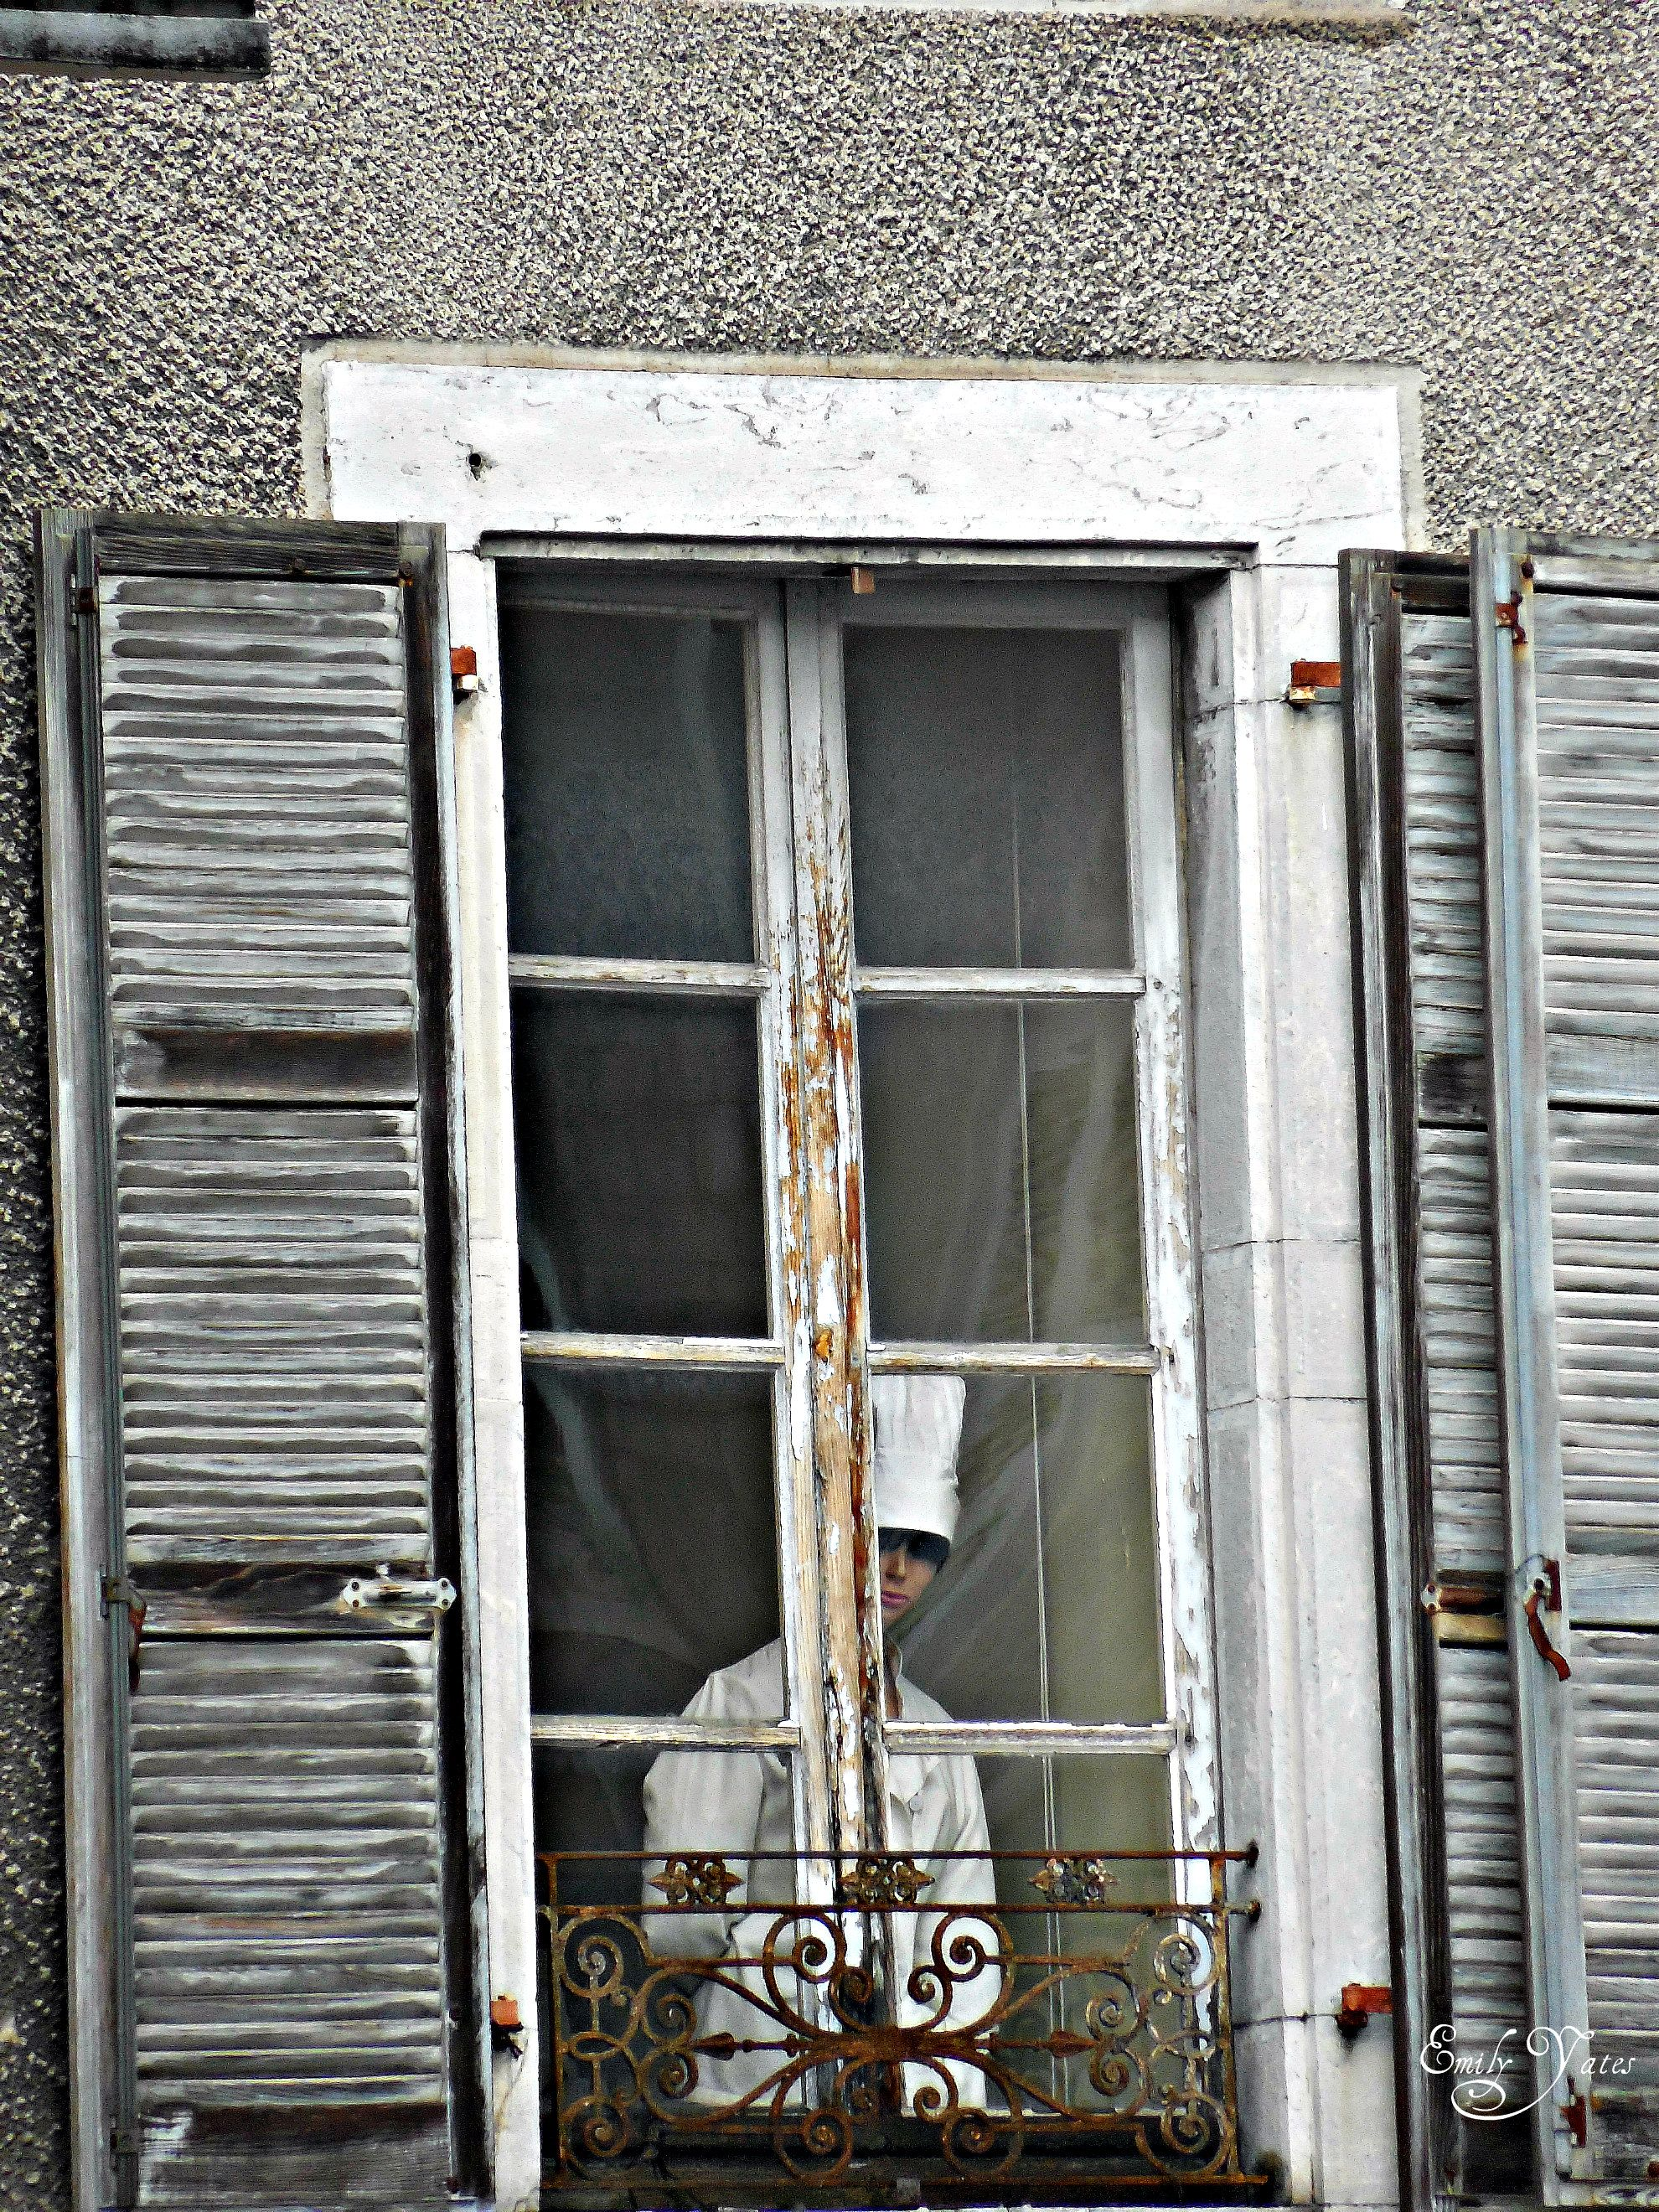 Window Lourdes France Lourdes France Ladder Decor Decor